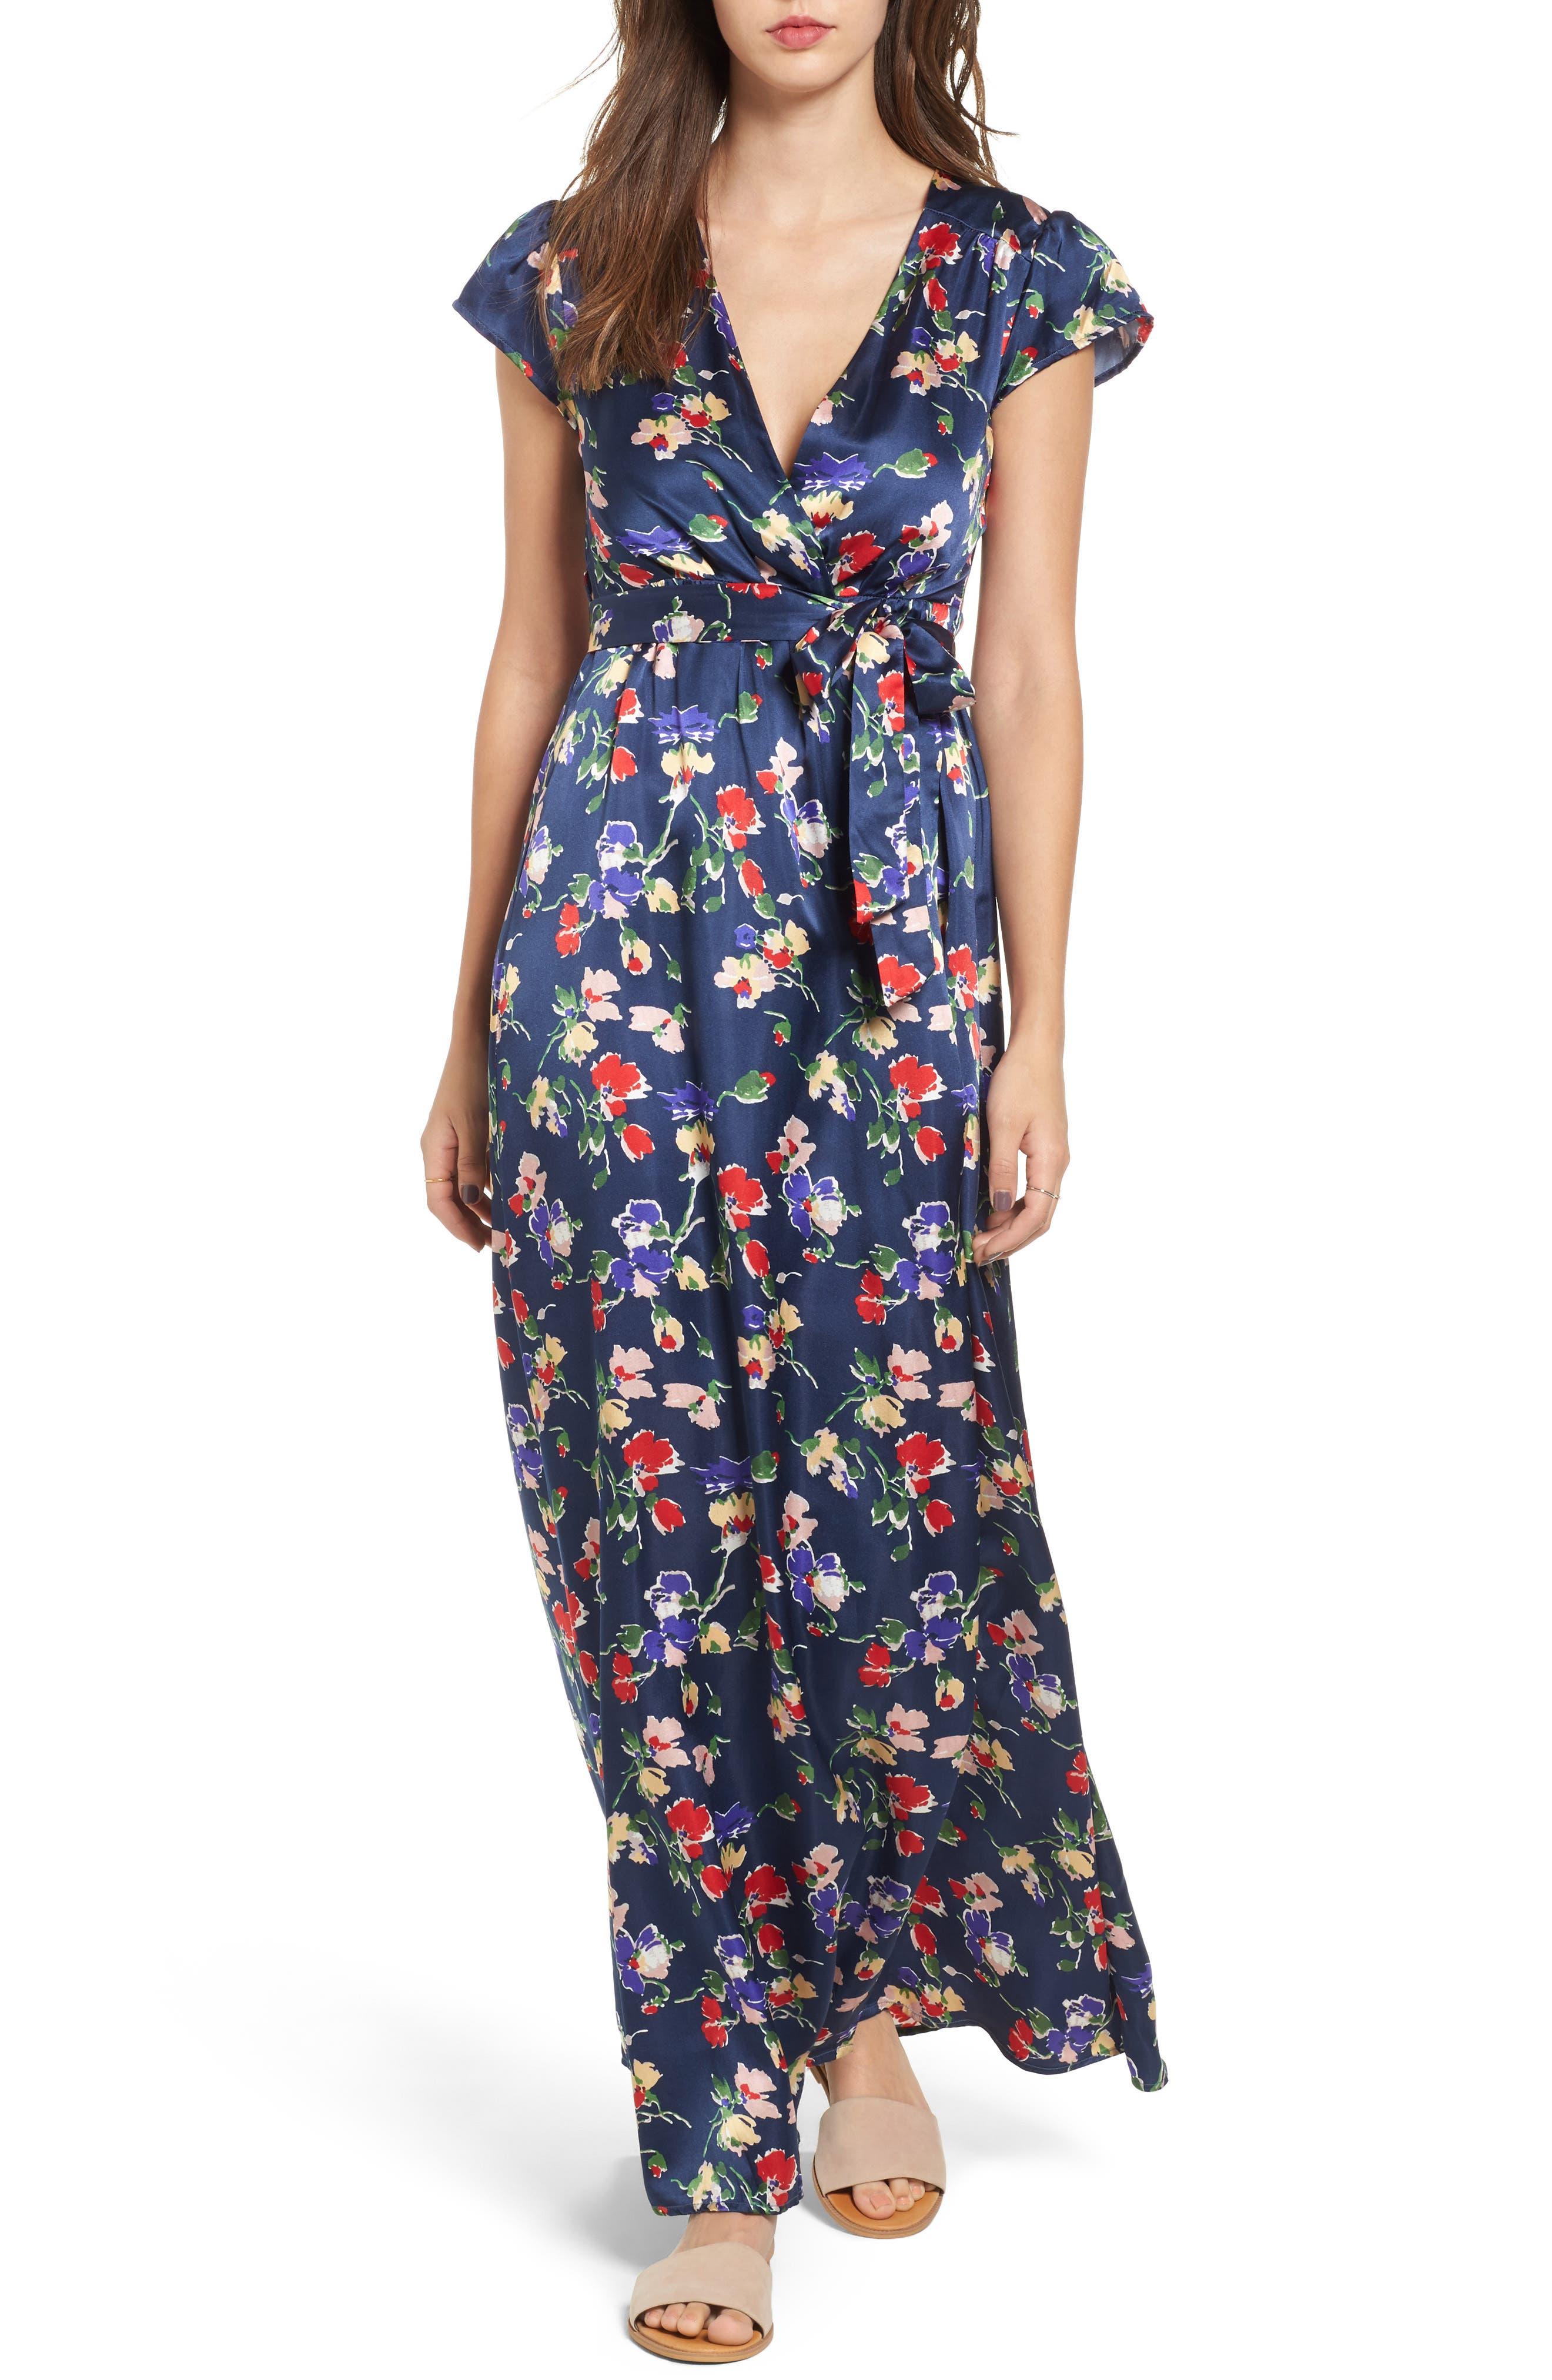 Tularosa Floral Satin Faux Wrap Maxi Dress